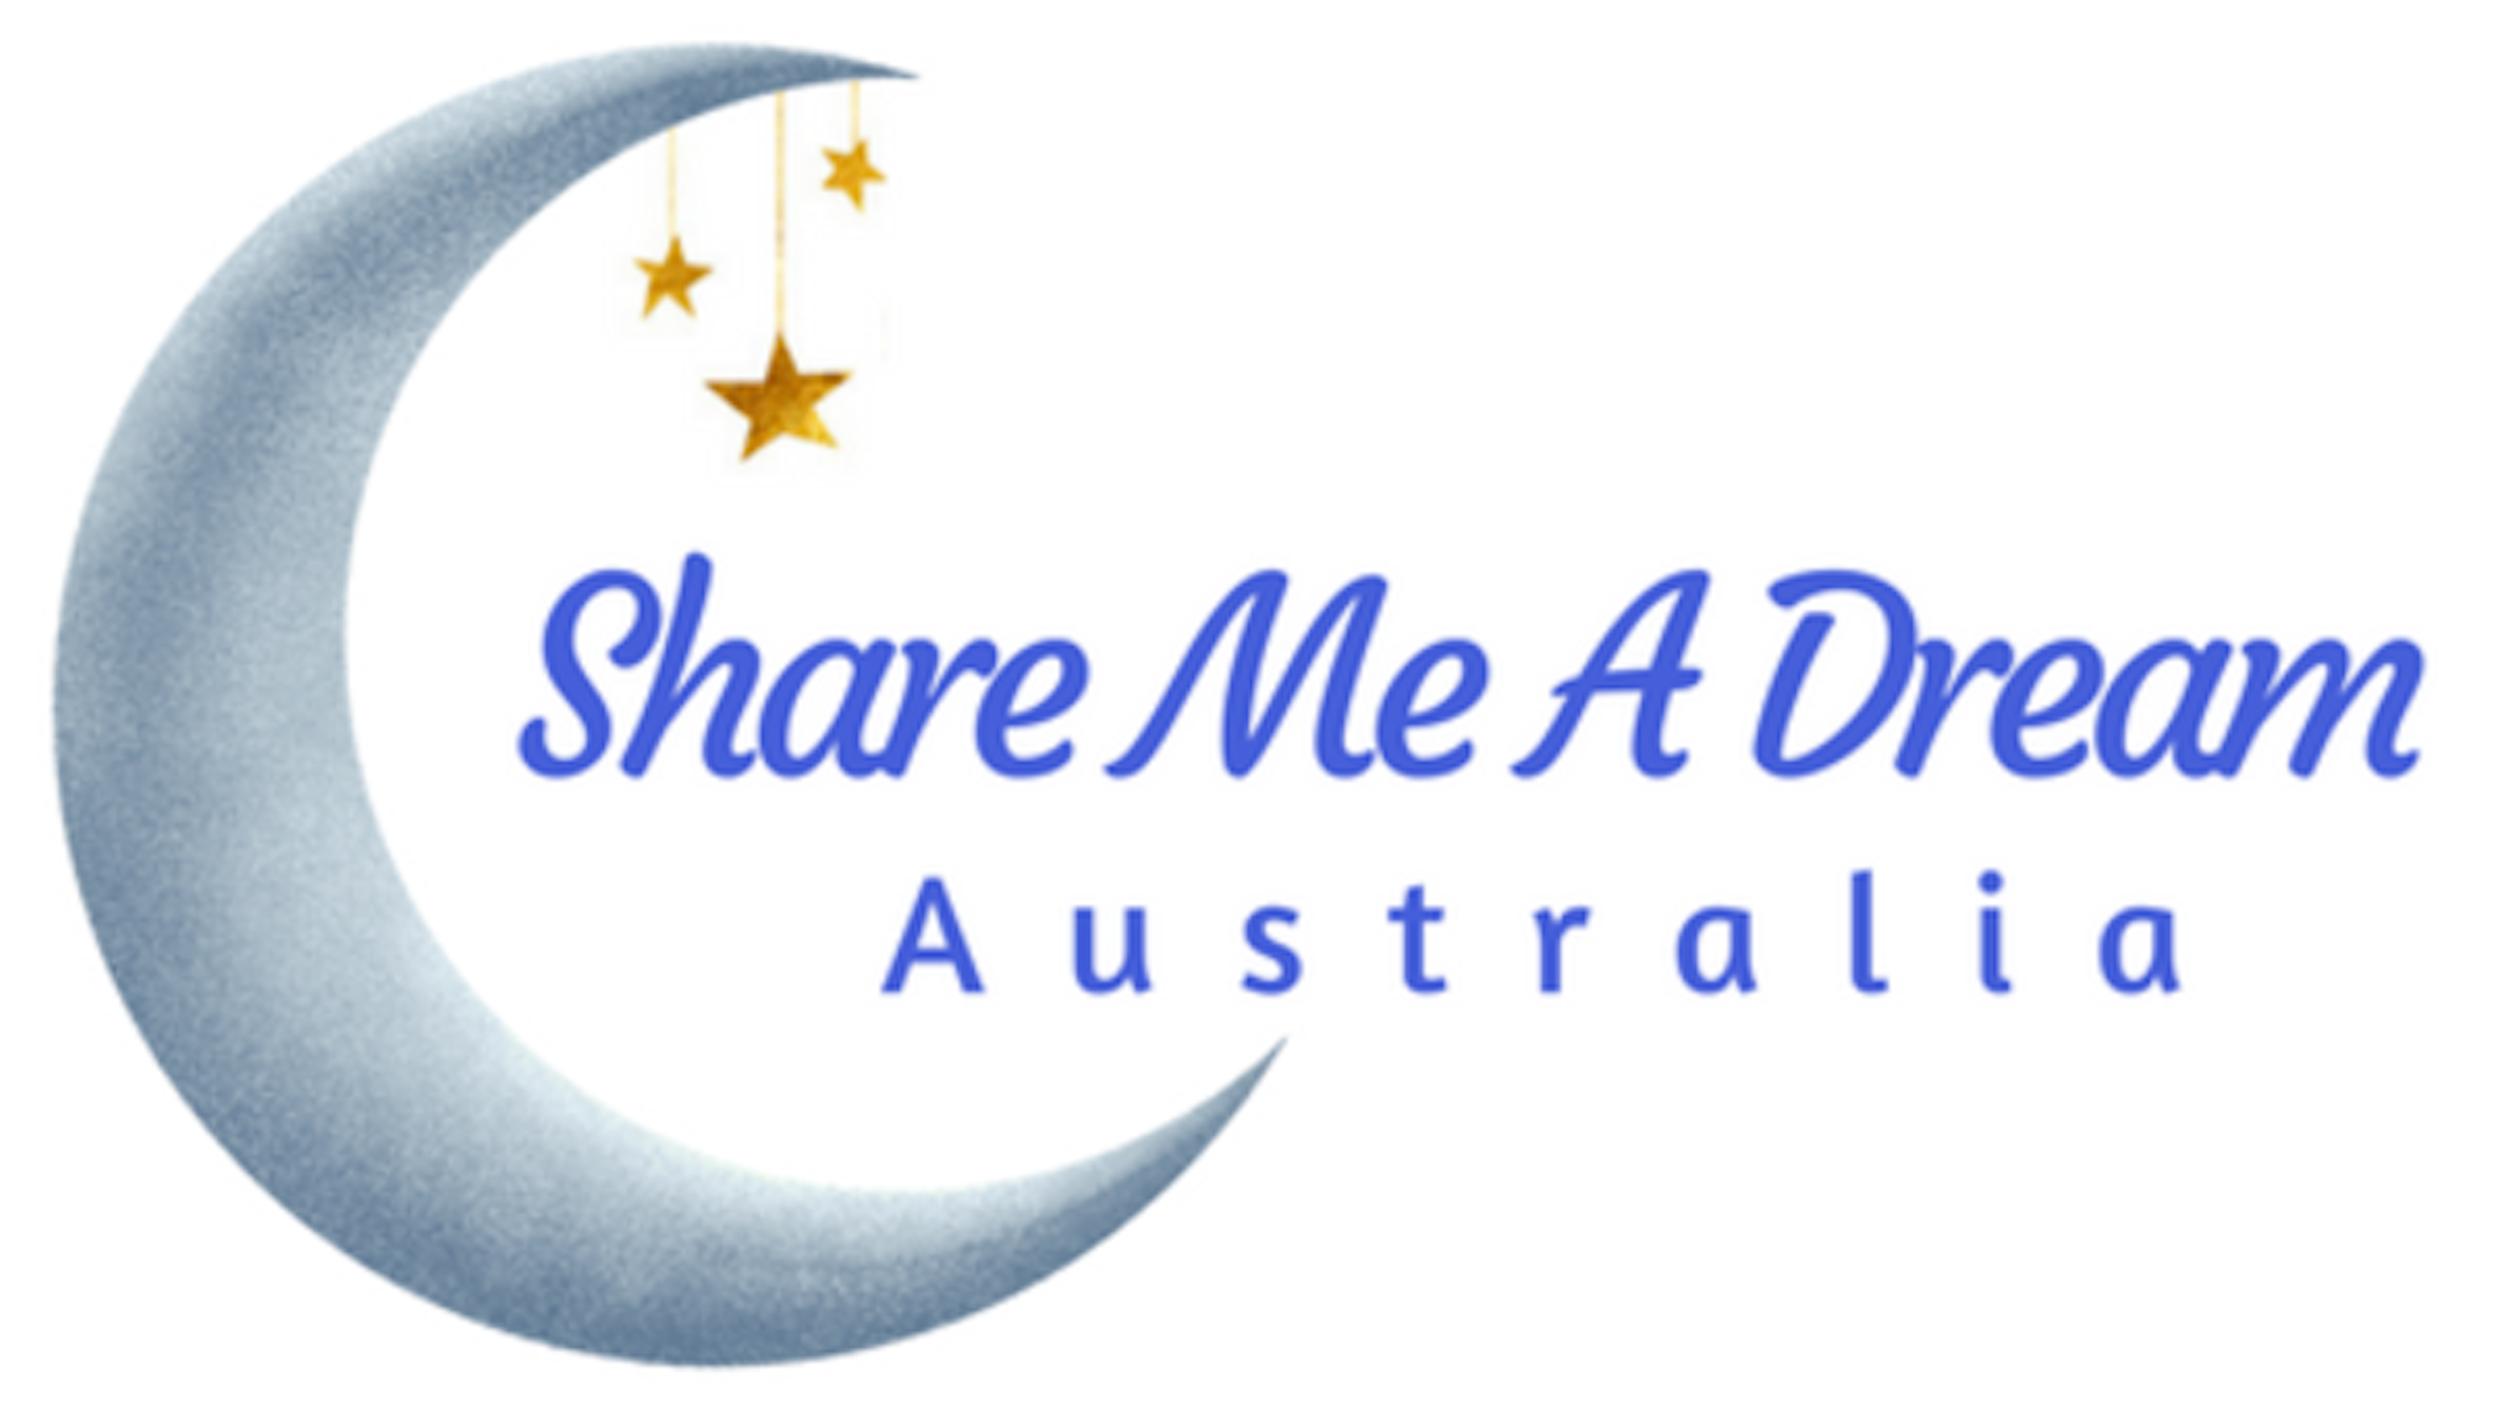 share-me-a-dream-australia-melbourne-charity-nonprofit-philippines-mindanao-davao-cebu.png